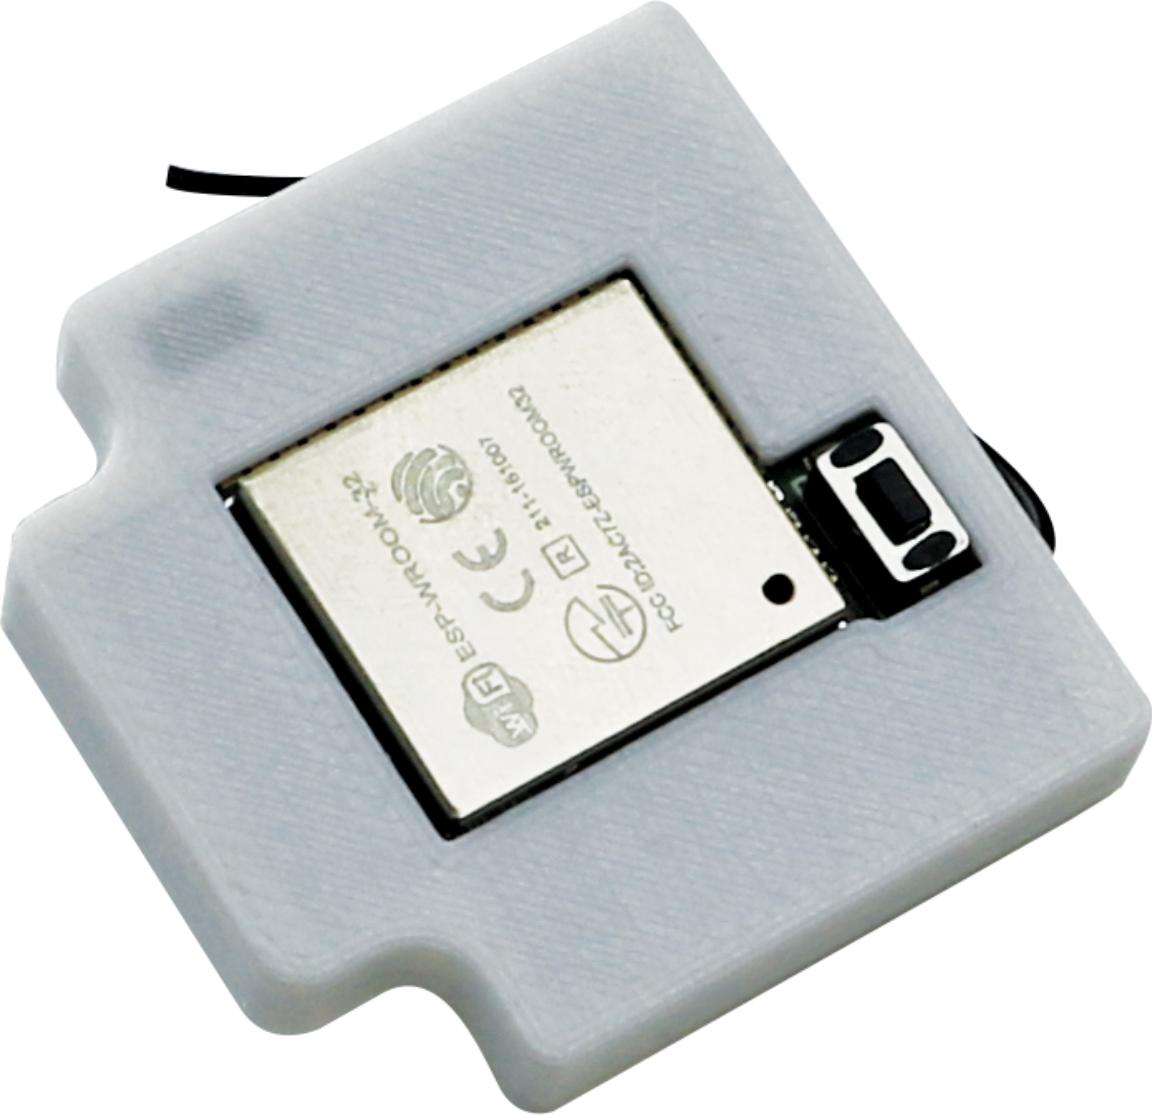 WiFi/Bluetooth Programmer